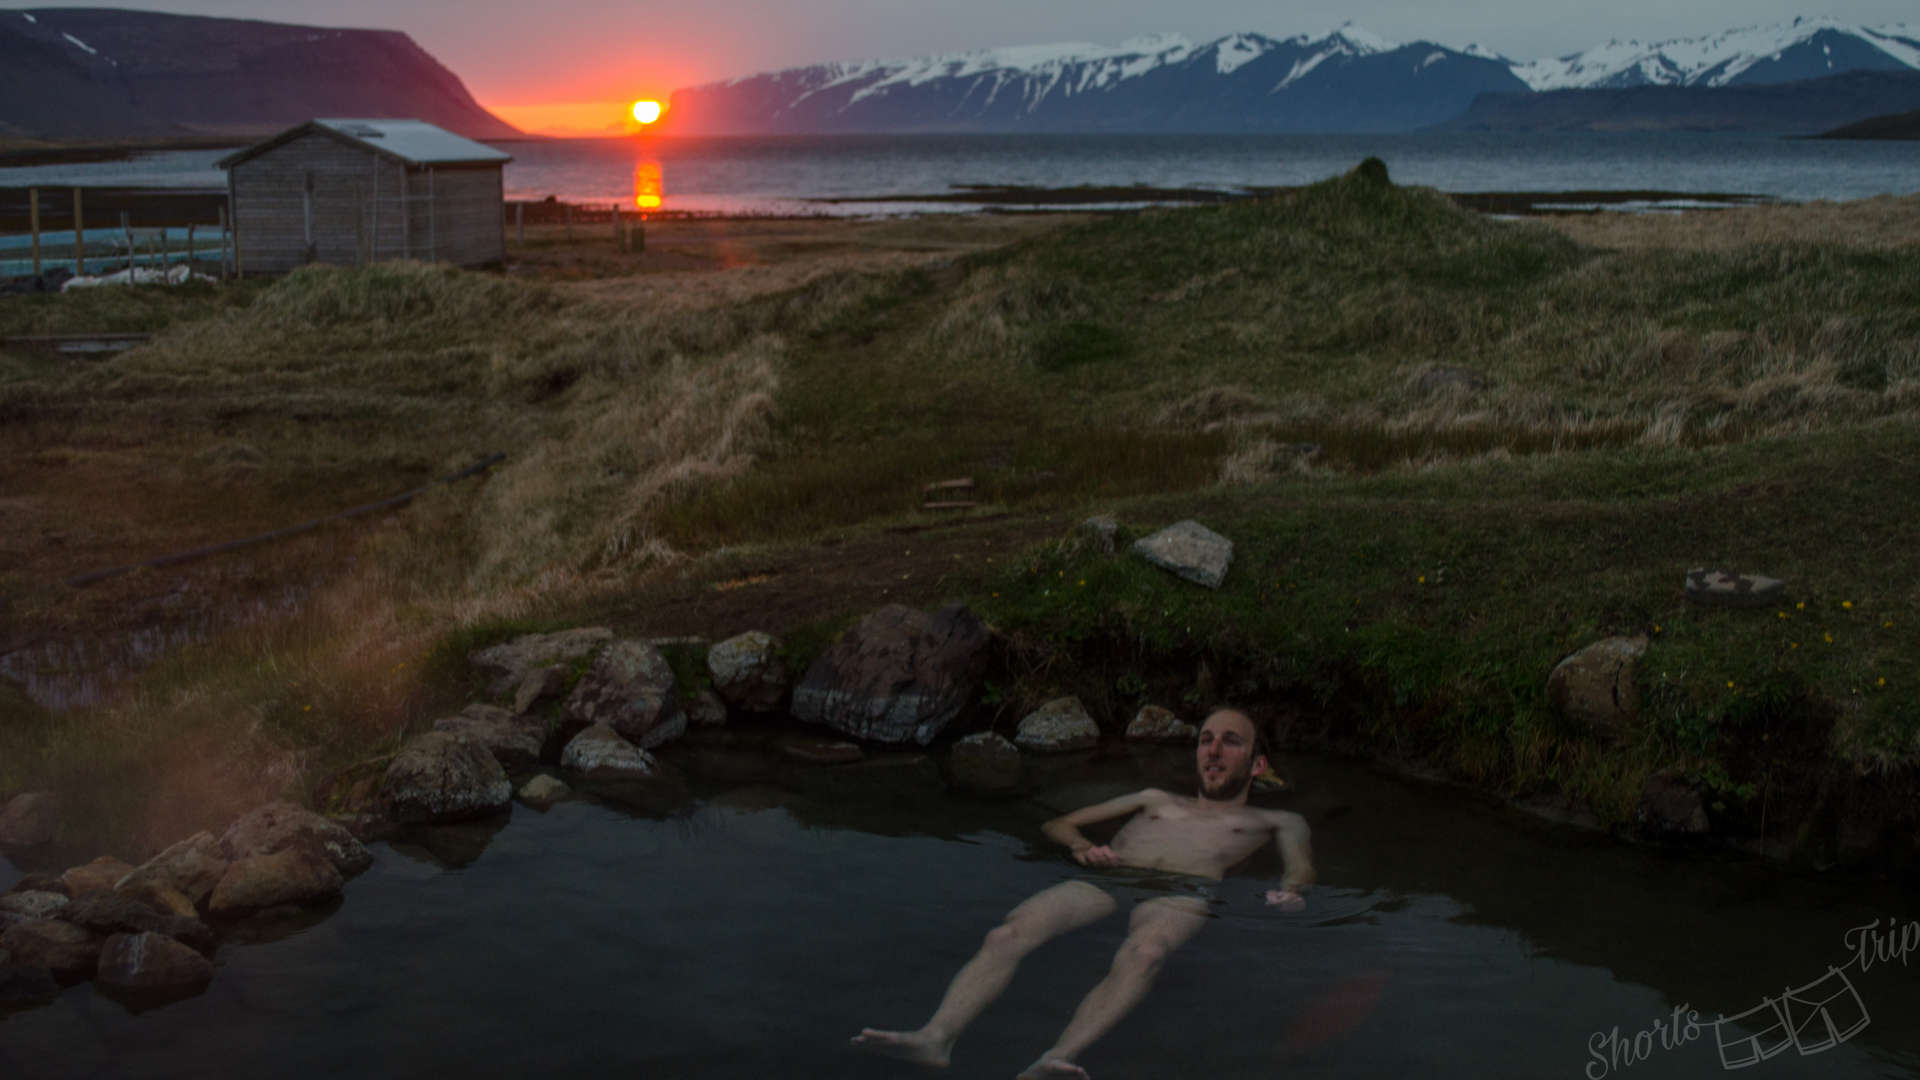 Reykjafjarðarlaug, Reykjafjarðarlaug sunset, кемпинг в Исландии